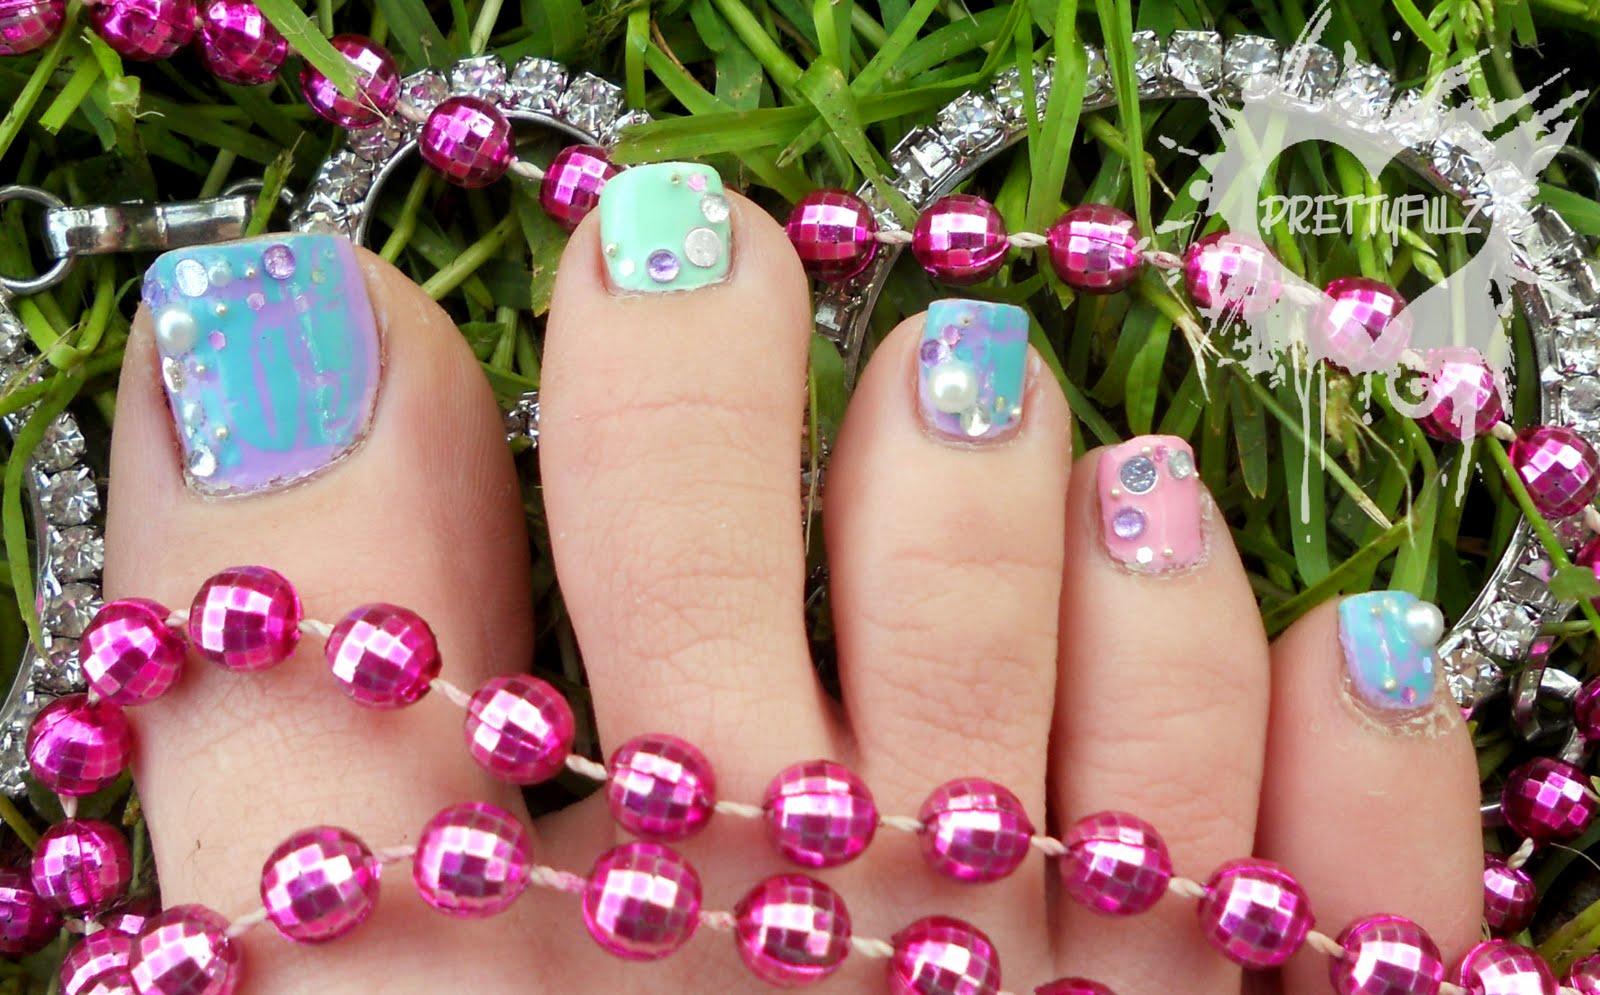 Prettyfulz: Pastel Colored Pedicure Nail Art Design!